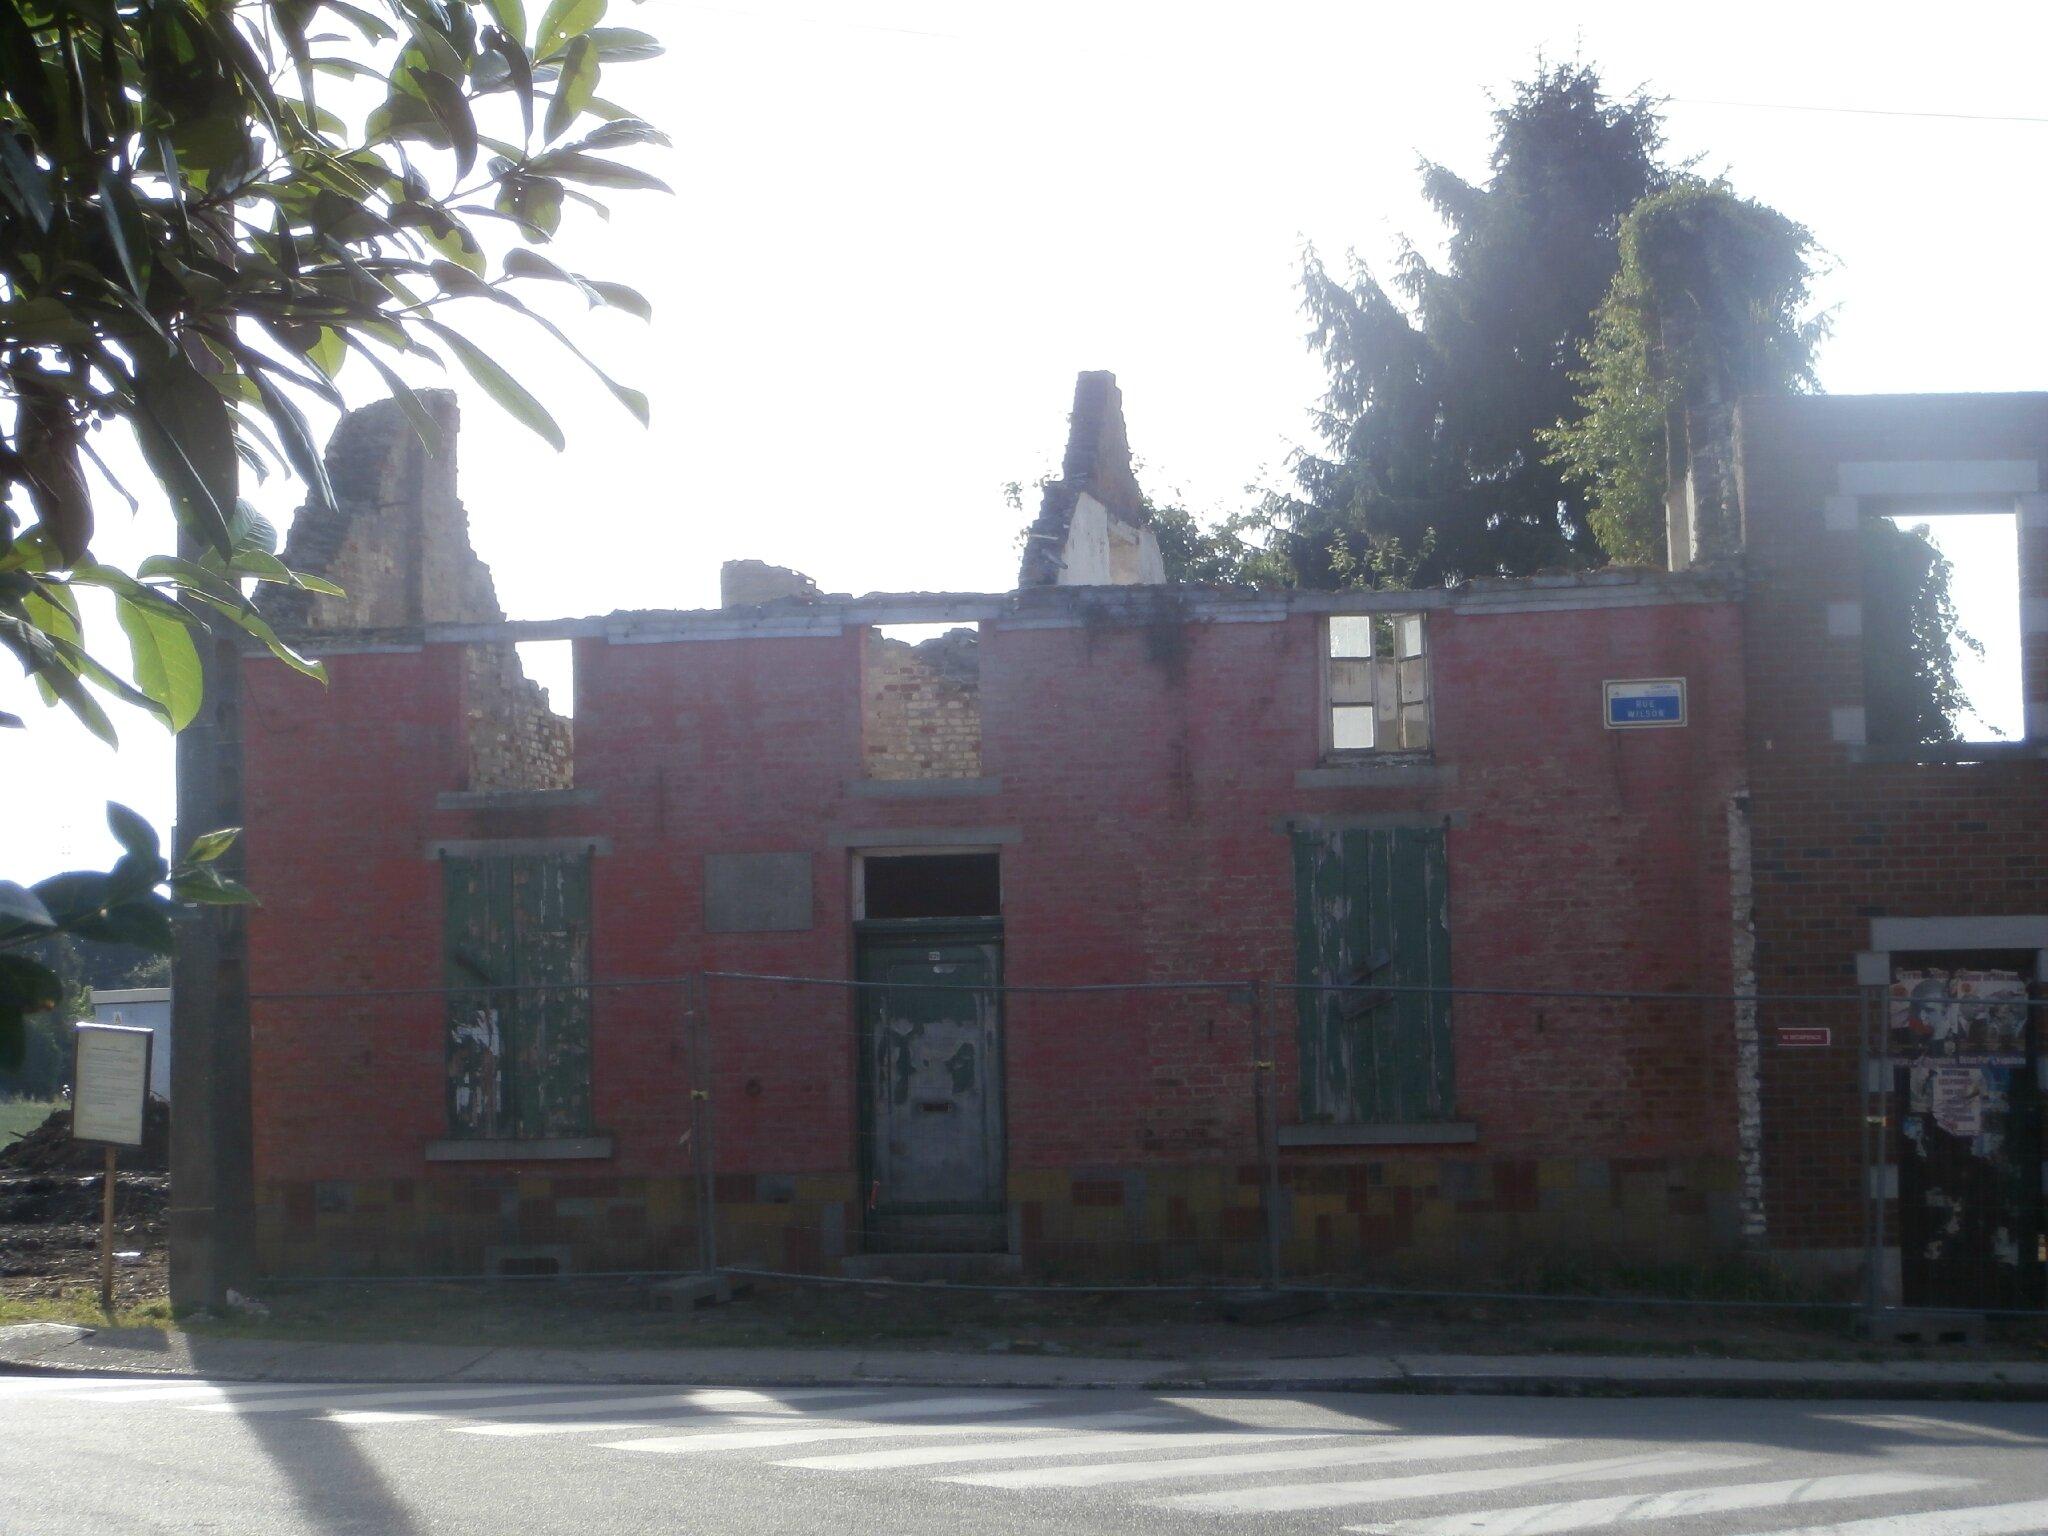 Maison Denis - 2014-06-12 - P6126137